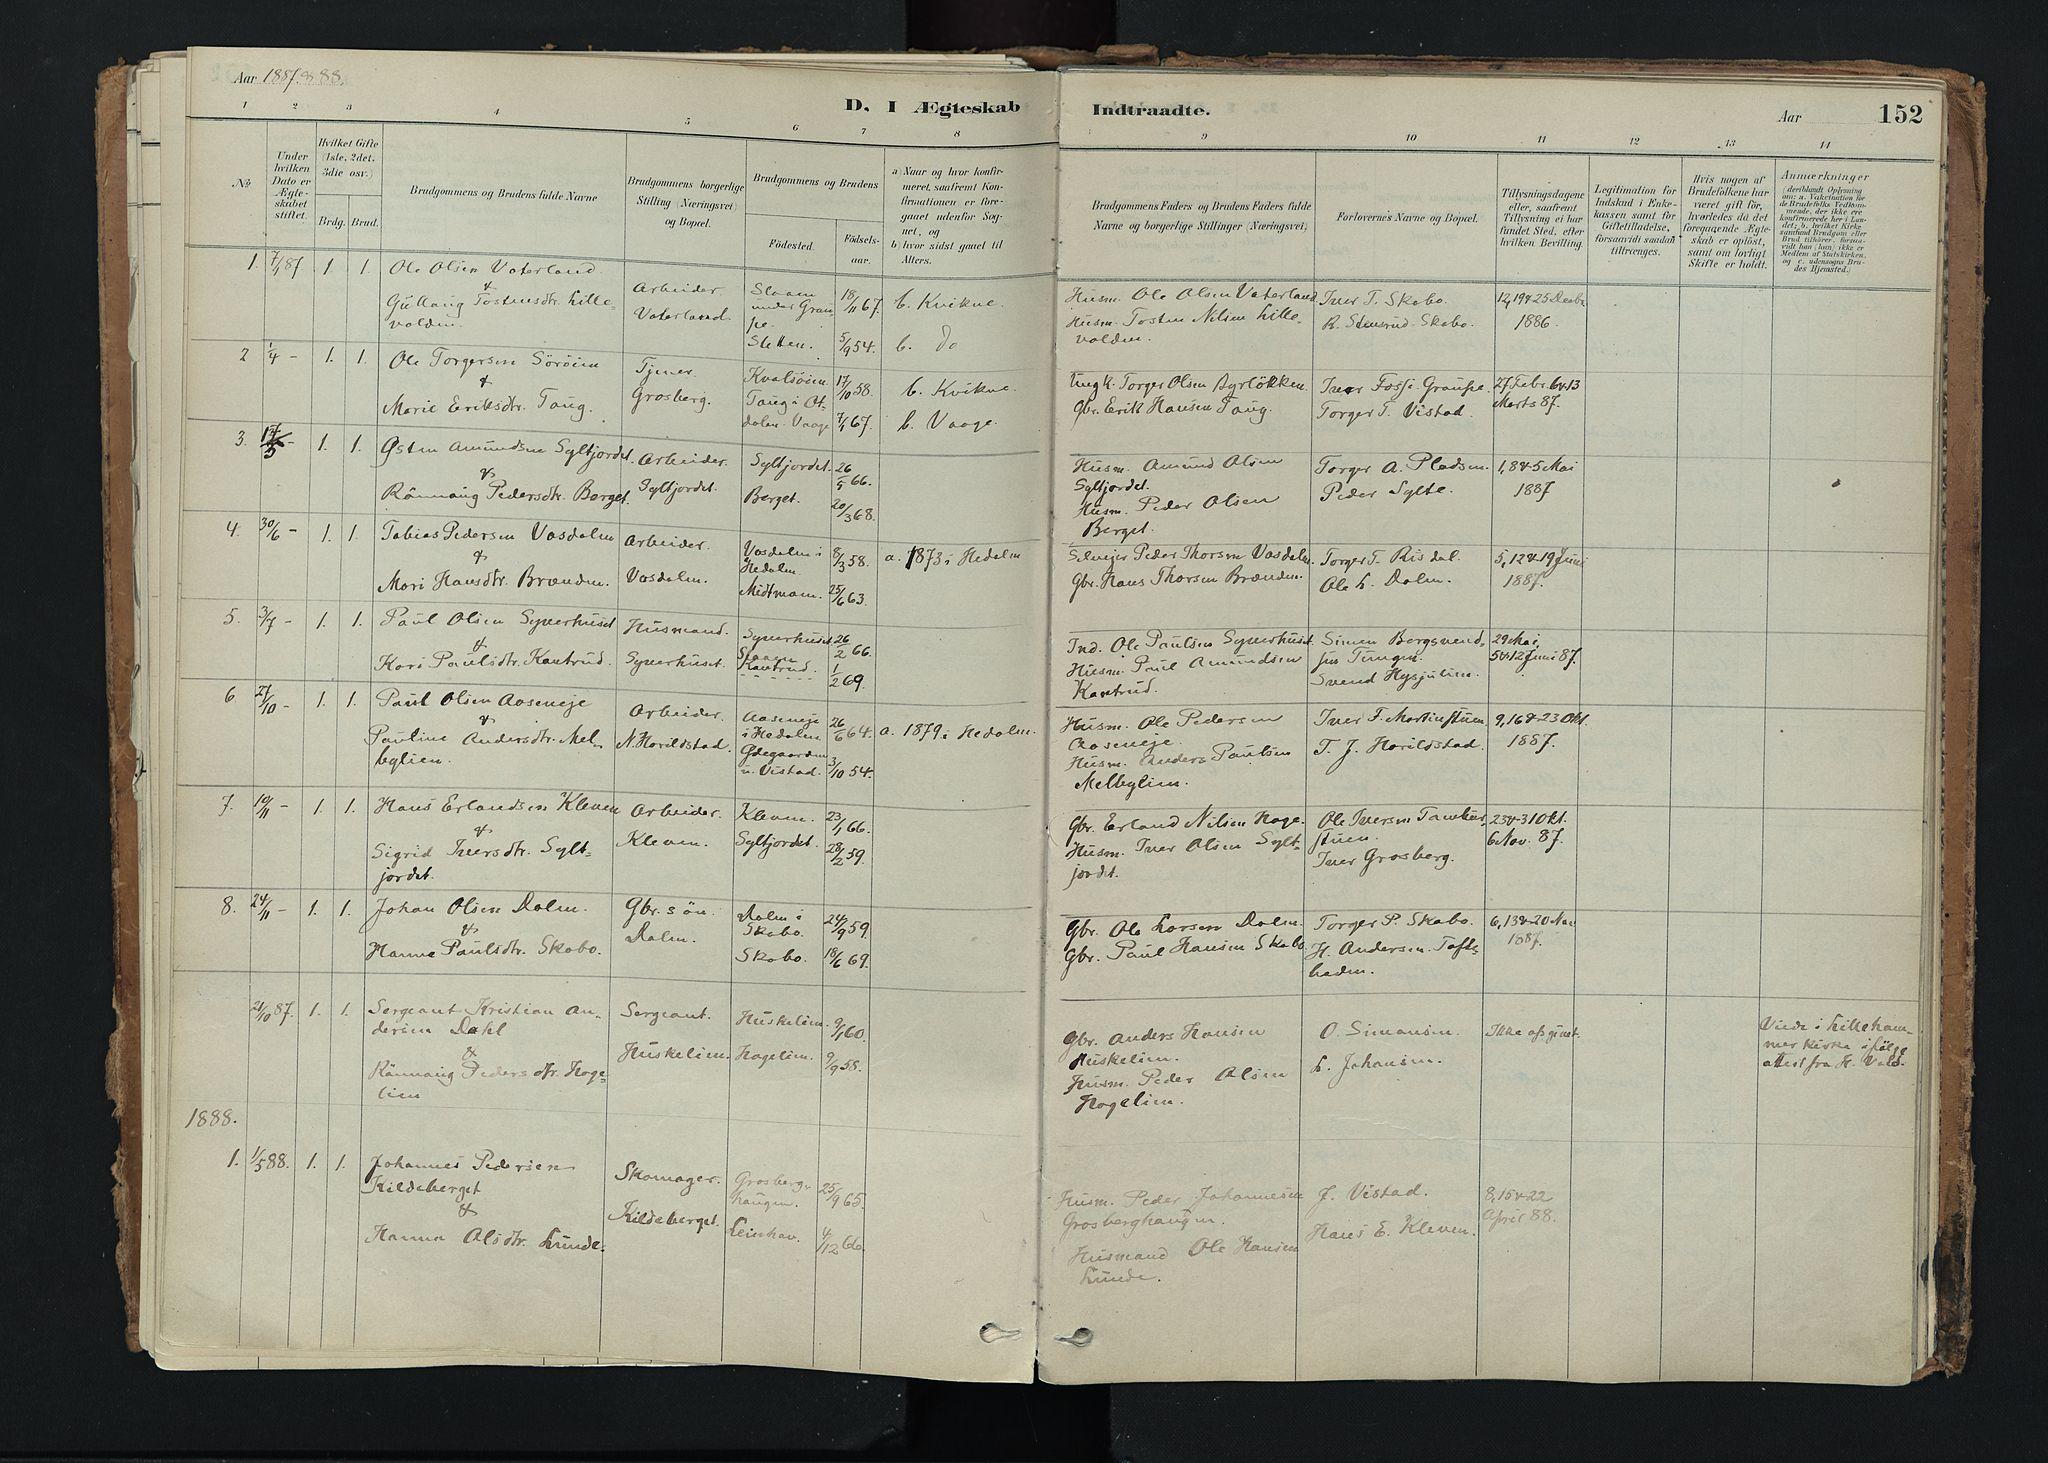 SAH, Nord-Fron prestekontor, Ministerialbok nr. 5, 1884-1914, s. 152